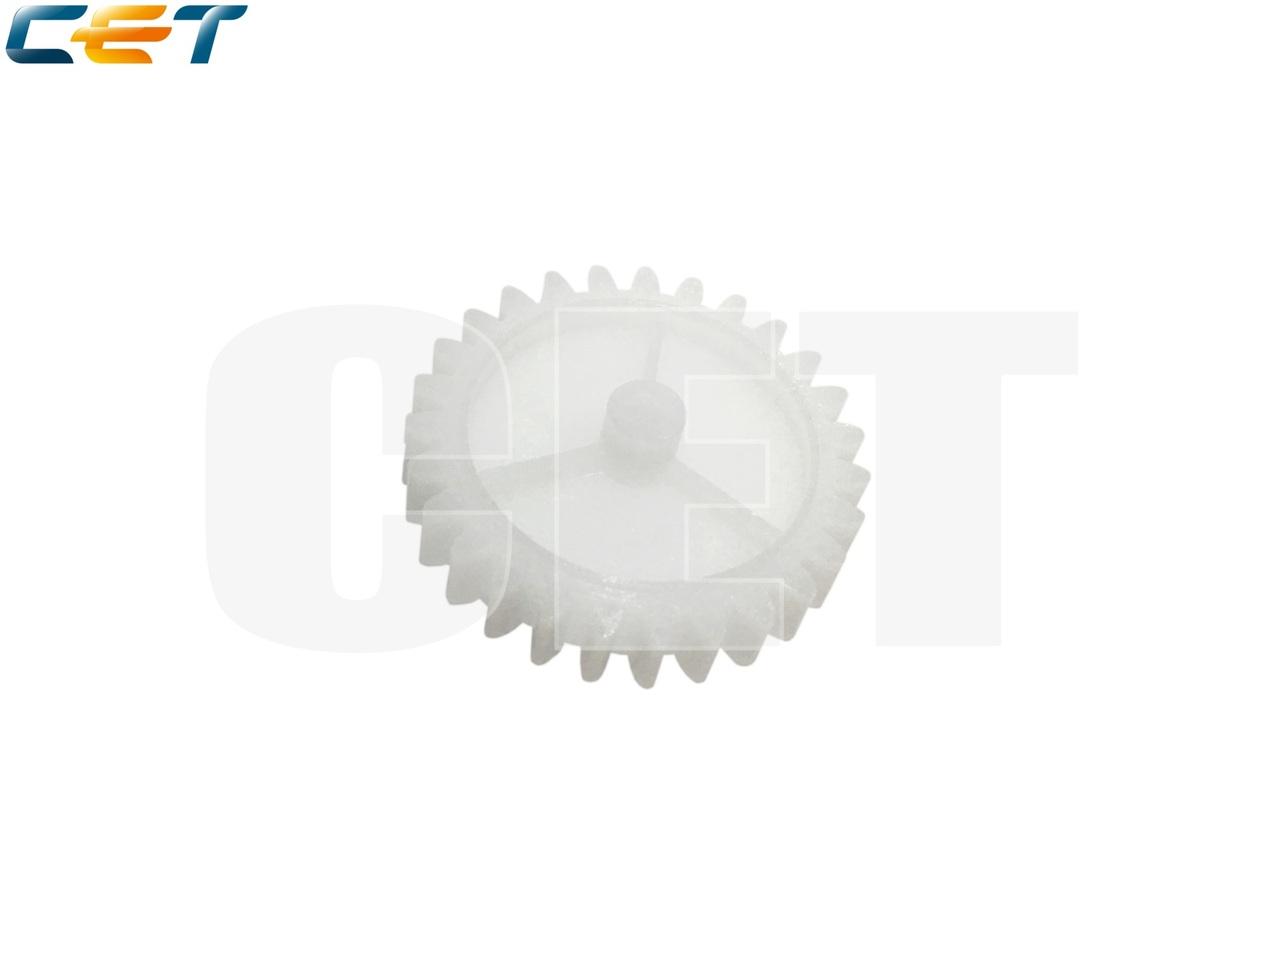 Шестерня привода 27Т RU5-0307-000 для HP LaserJet1320/P2015/P2055 (CET), DGP7497